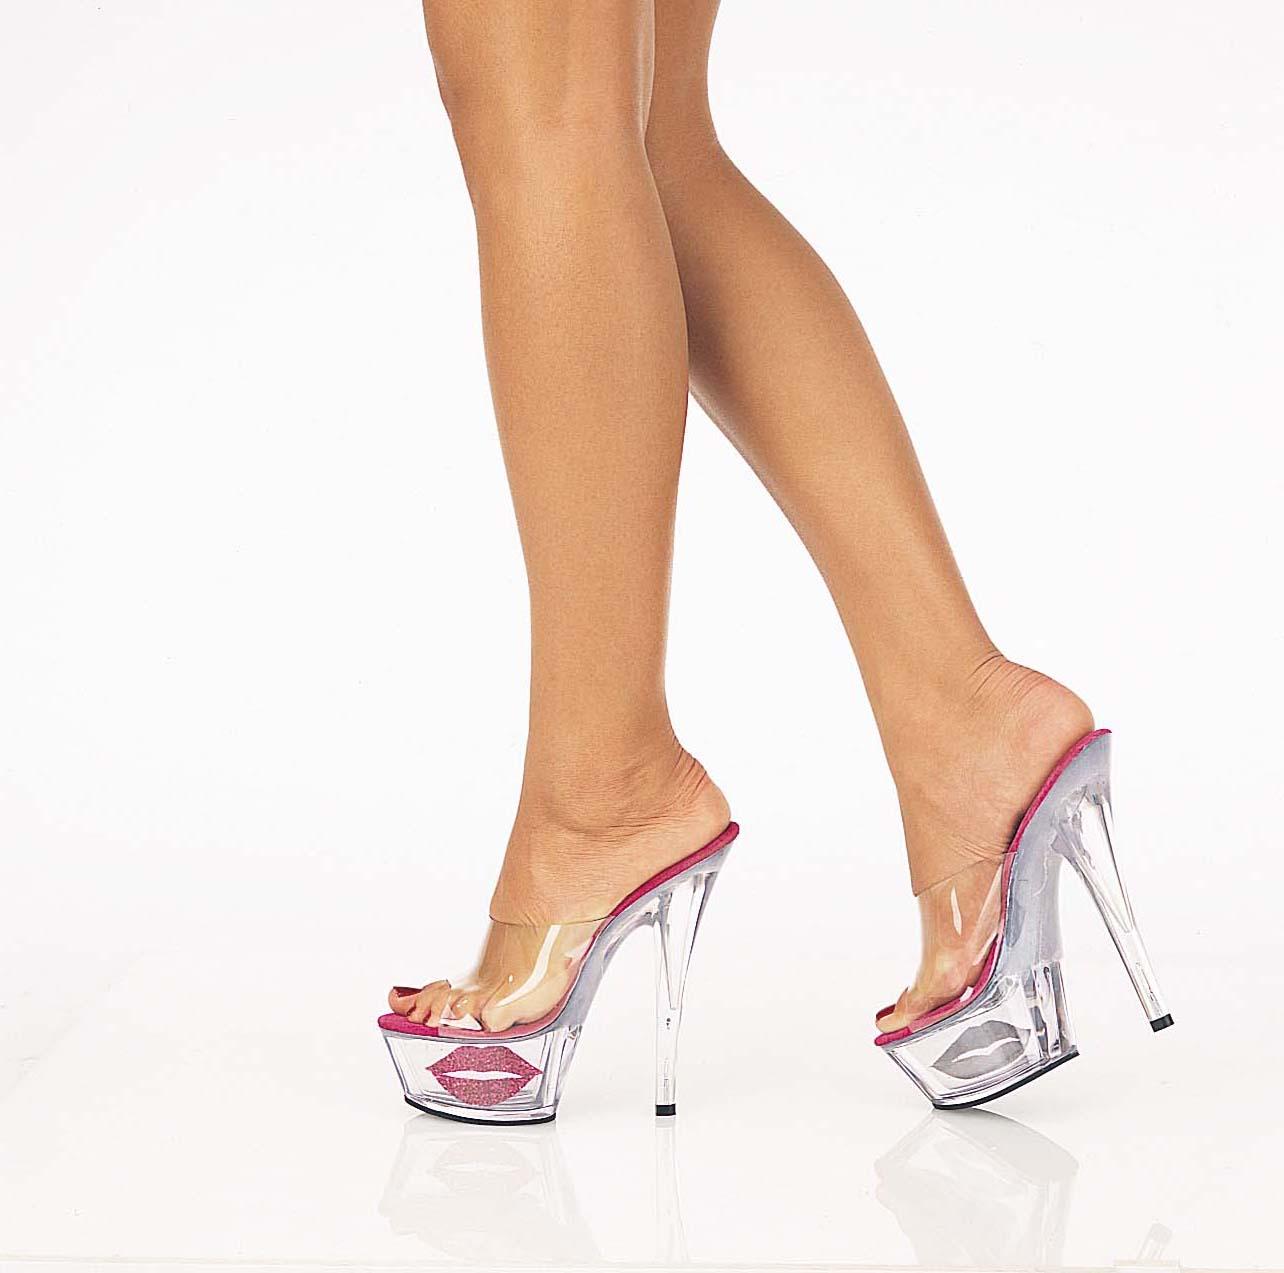 Sexy High Heel Slippers